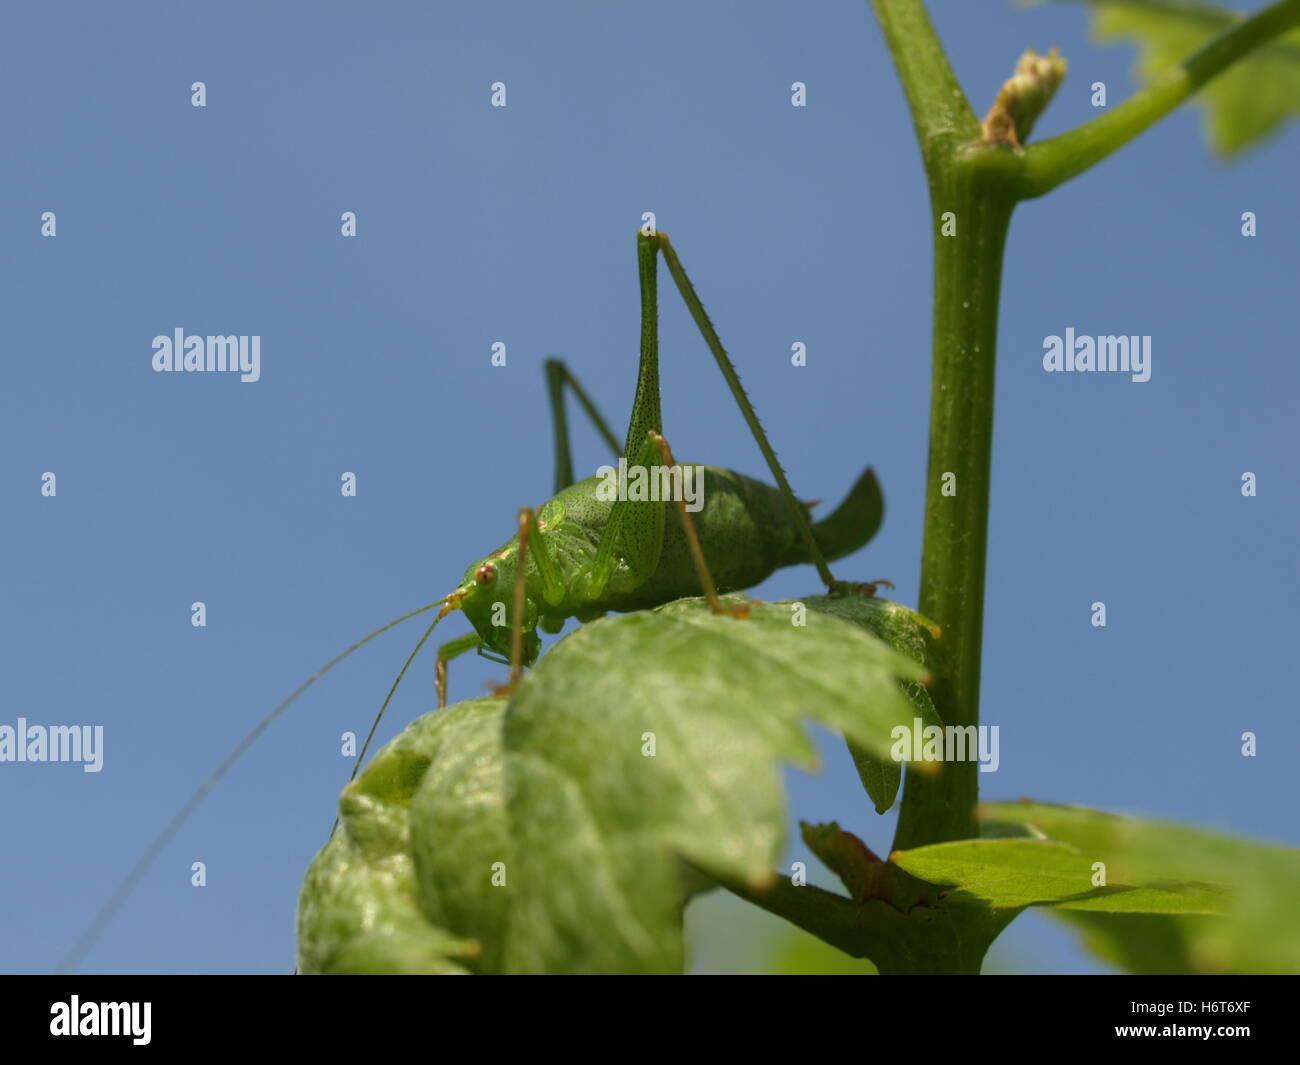 plump schrecke - Stock Image